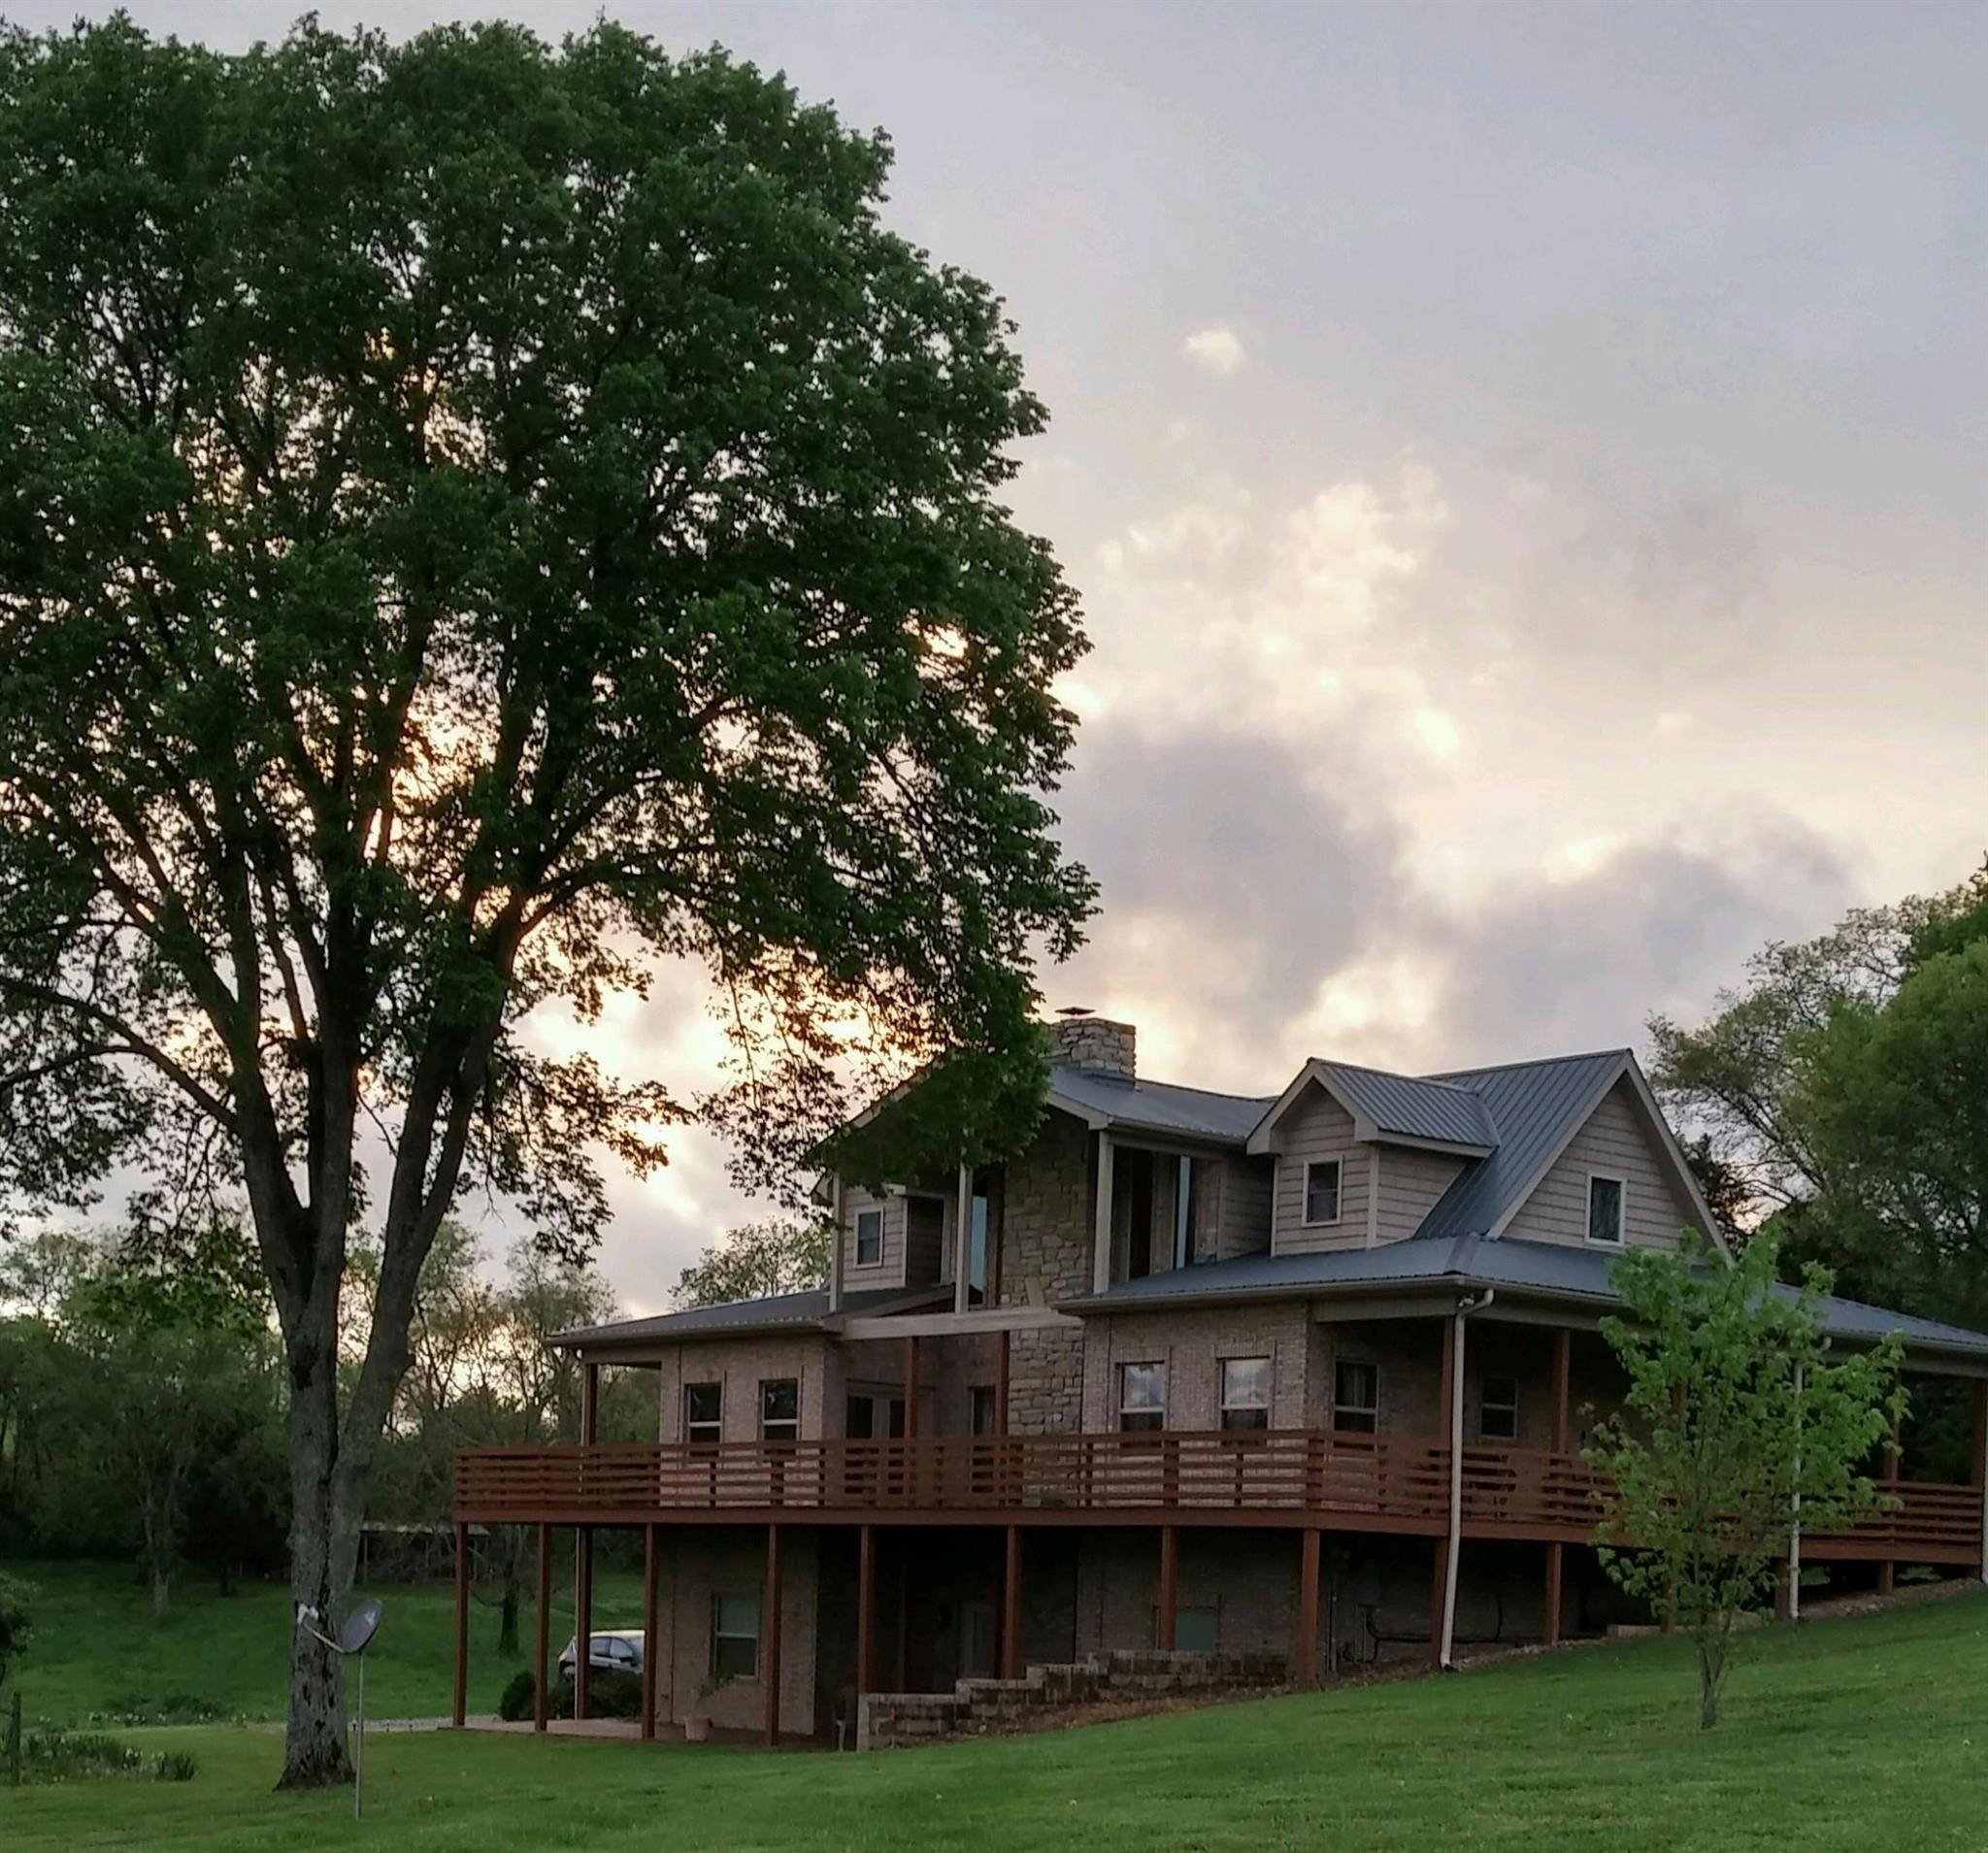 142 Dixon Ln, Castalian Springs, TN 37031 - Castalian Springs, TN real estate listing